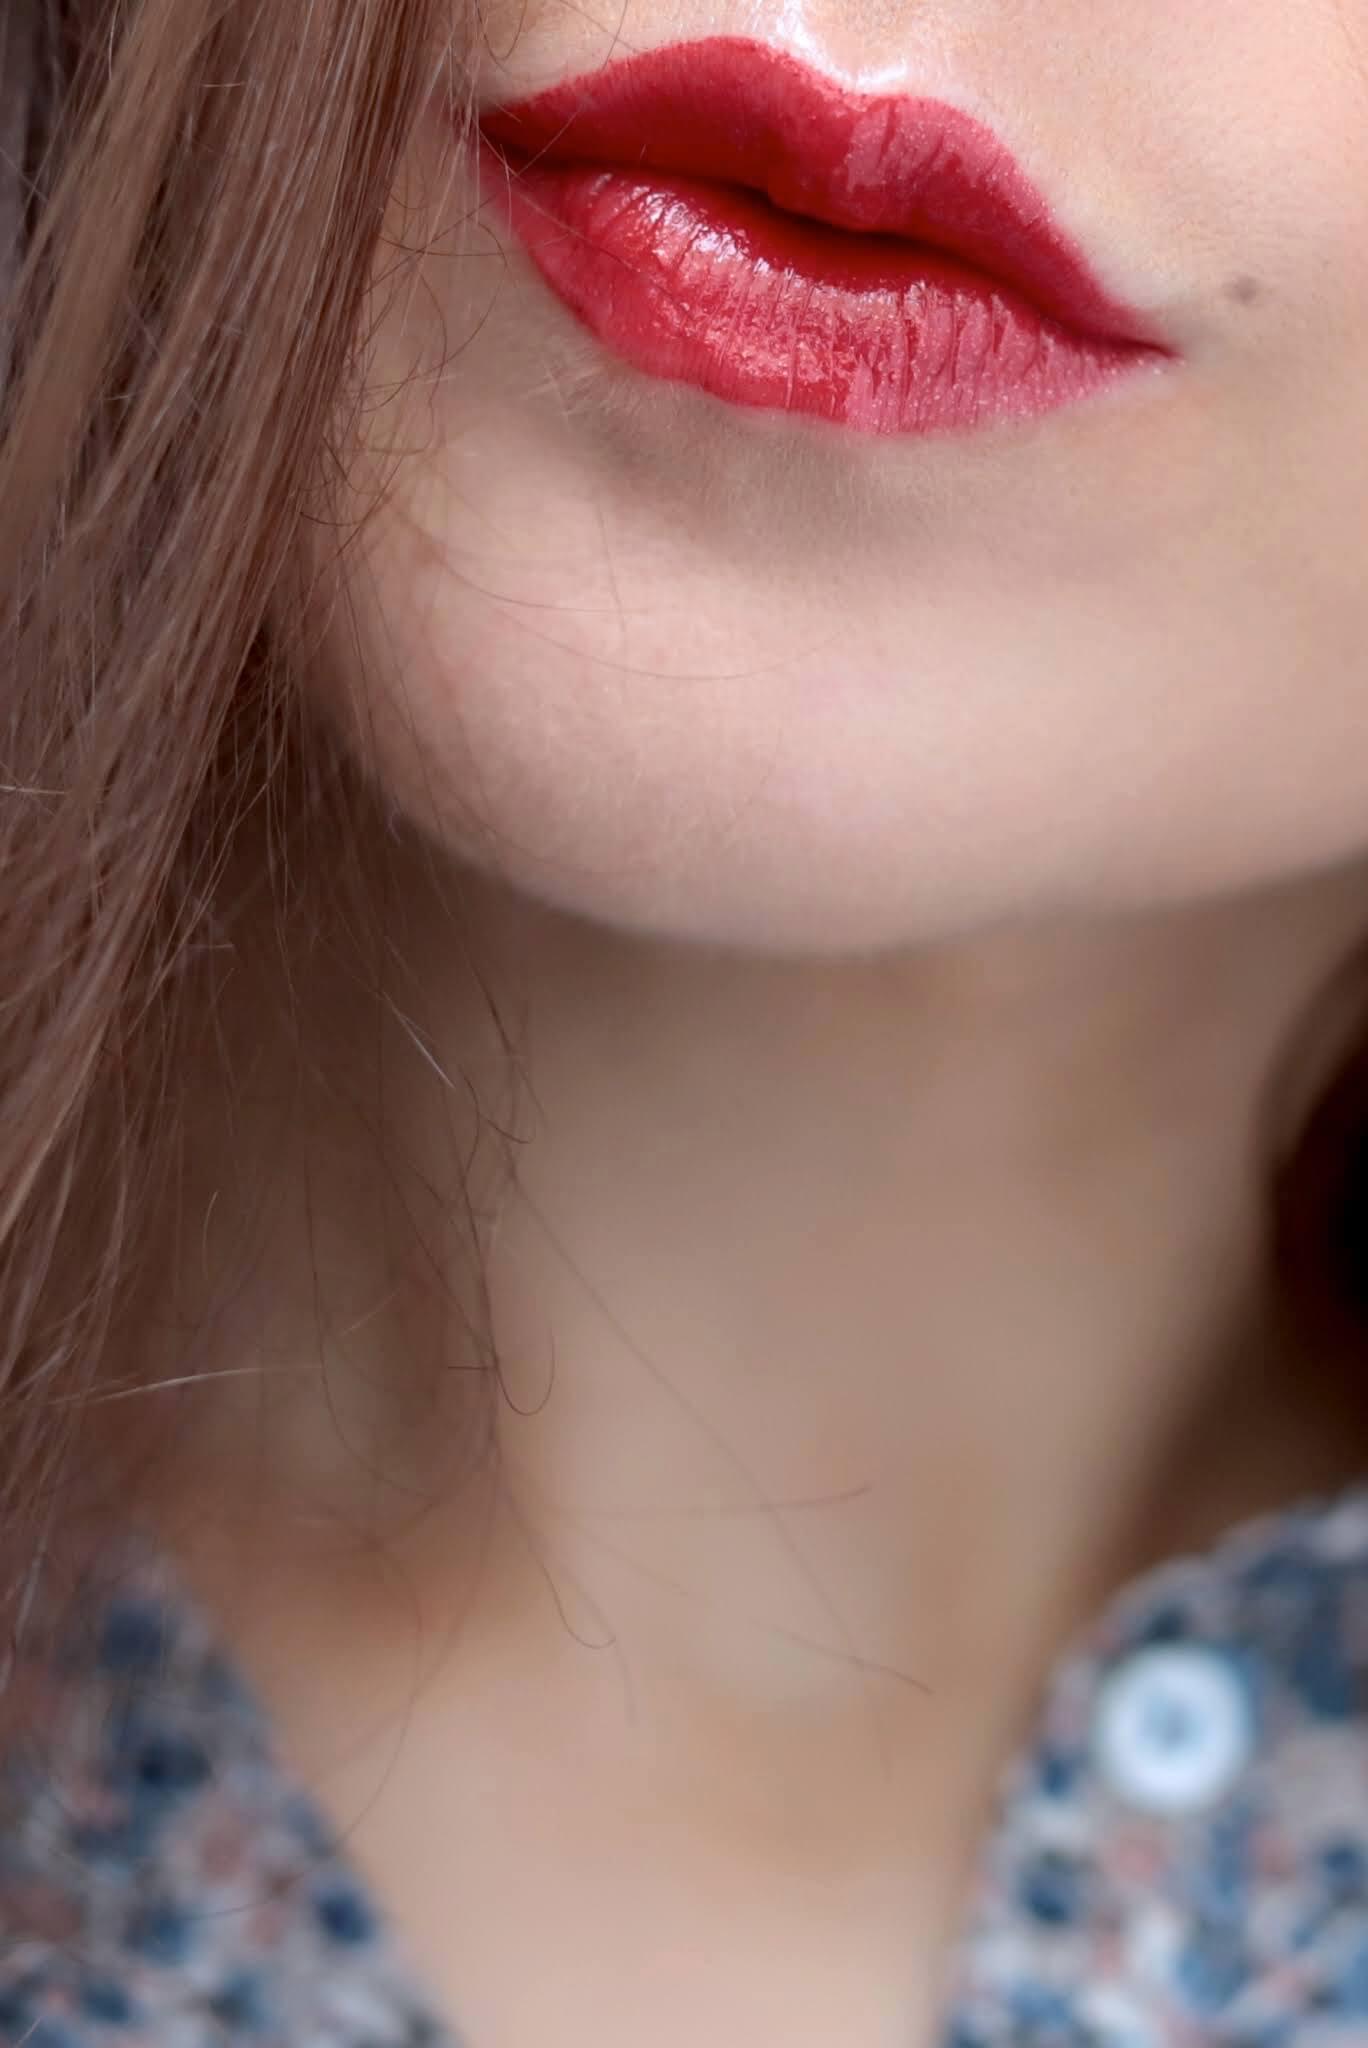 SUQQU Comfort Lip Glow 02 Musubishu